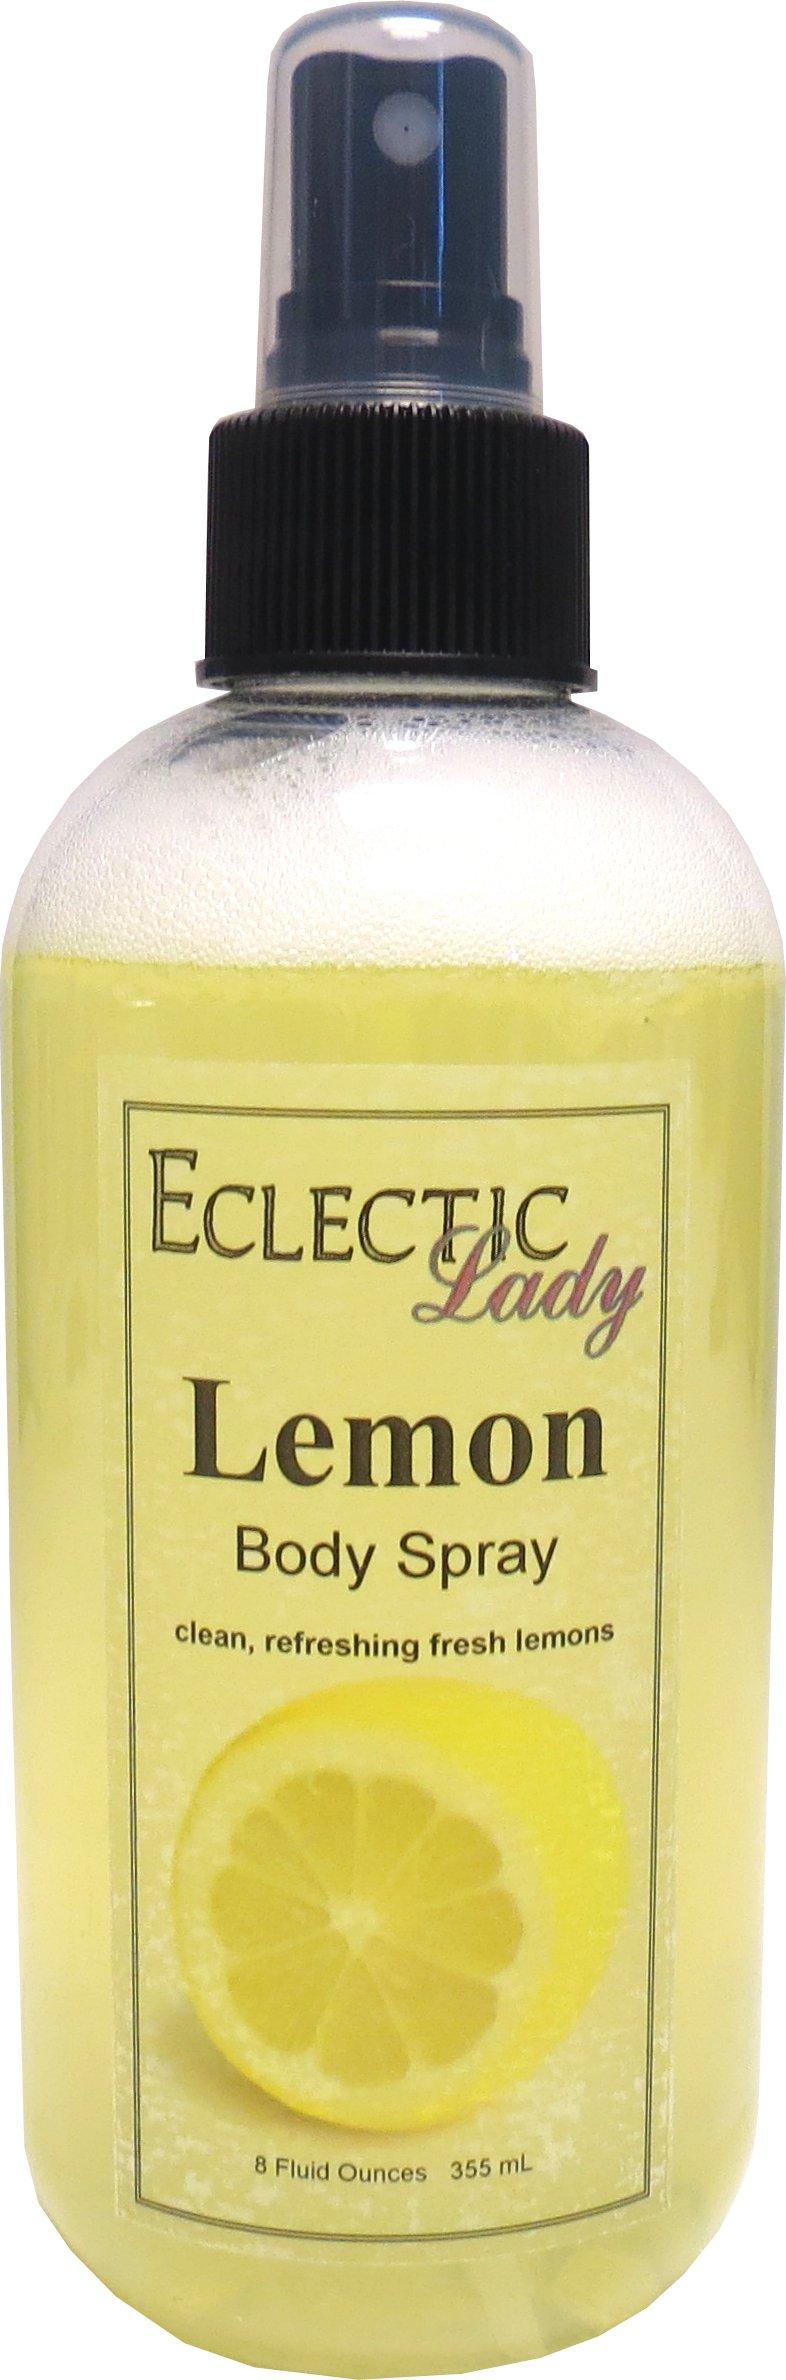 Lemon Body Spray, 8 ounces